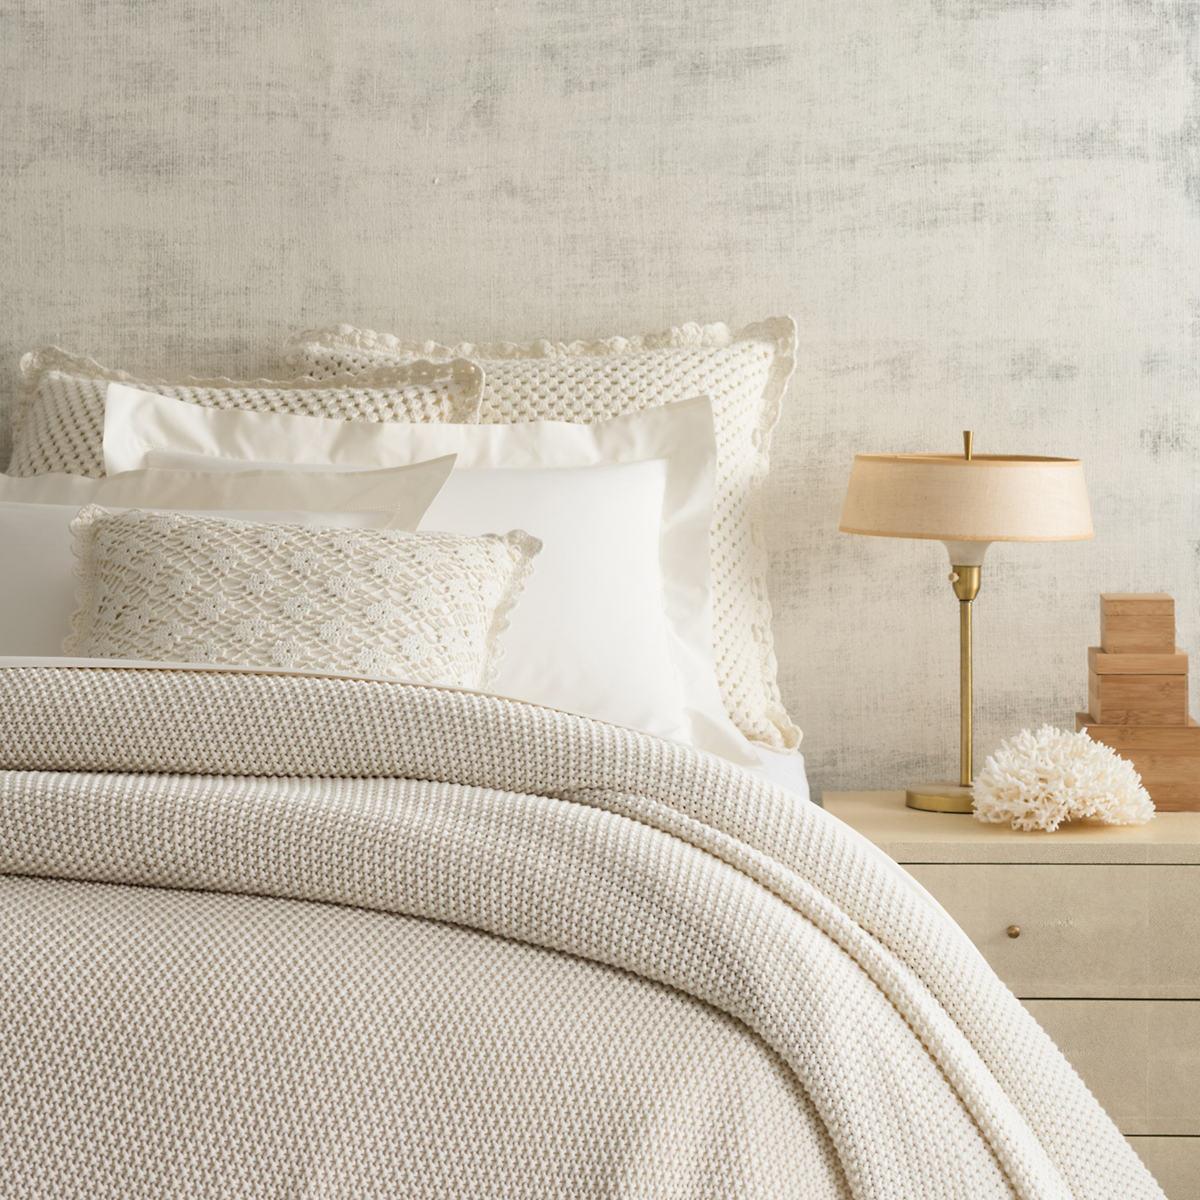 Remy Knit Ivory Blanket